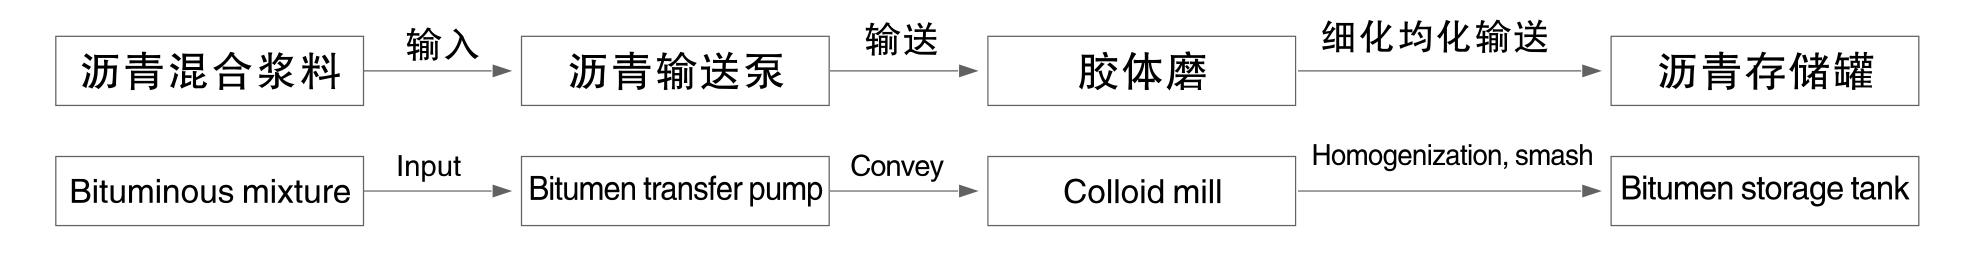 shanggui